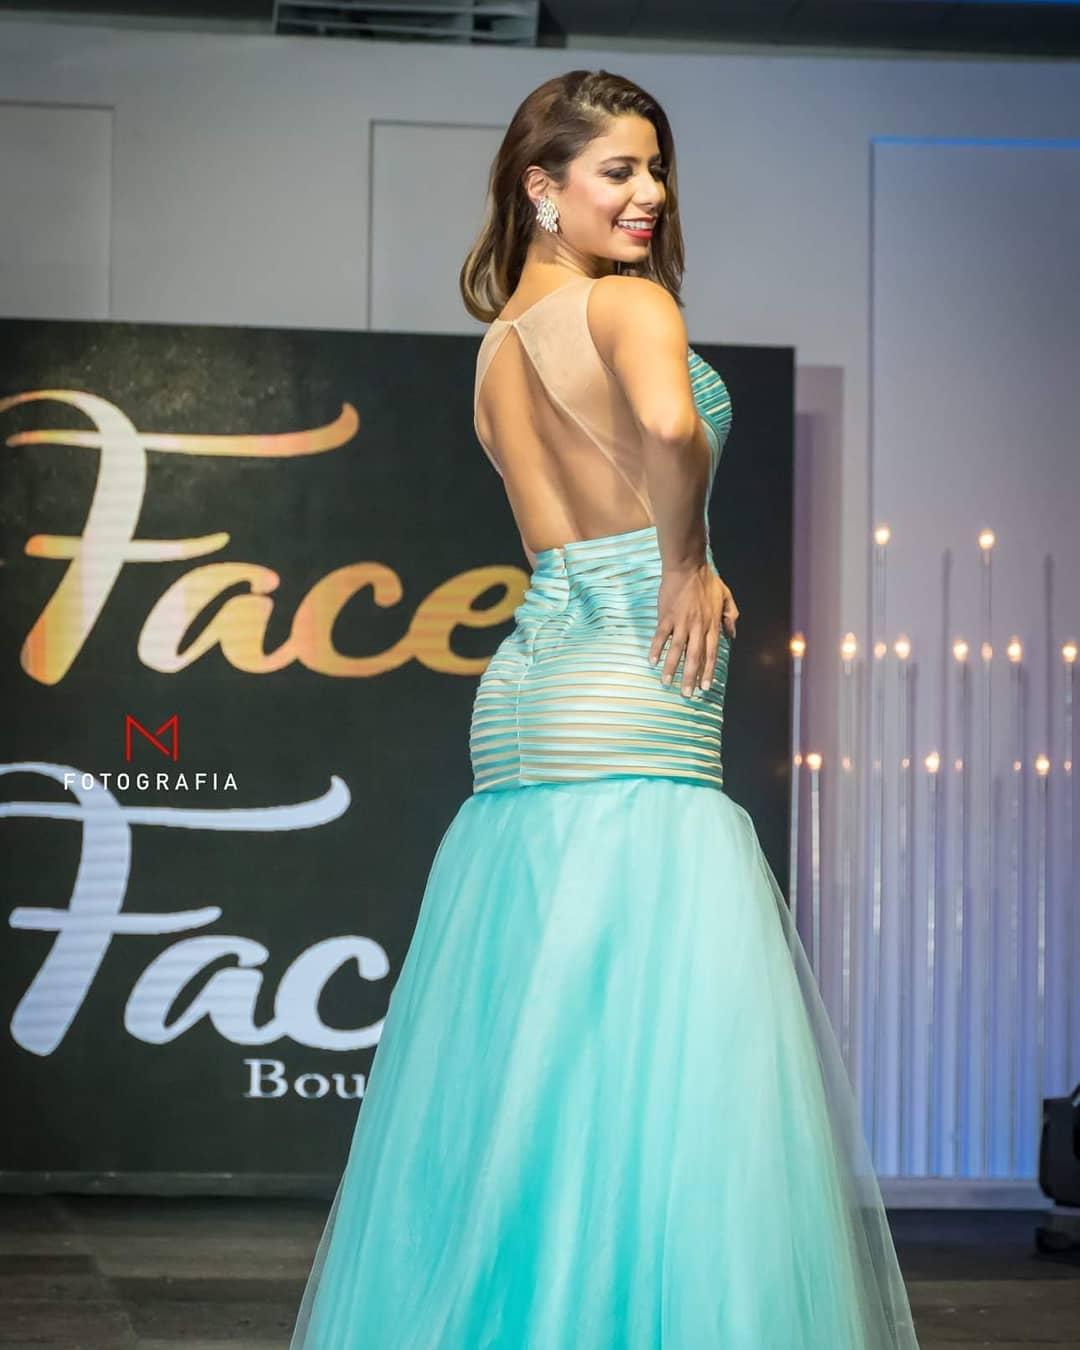 geraldine chaparro, miss usa hispanoamericana 2018/miss mundo latina turismo usa 2018. - Página 3 42728210